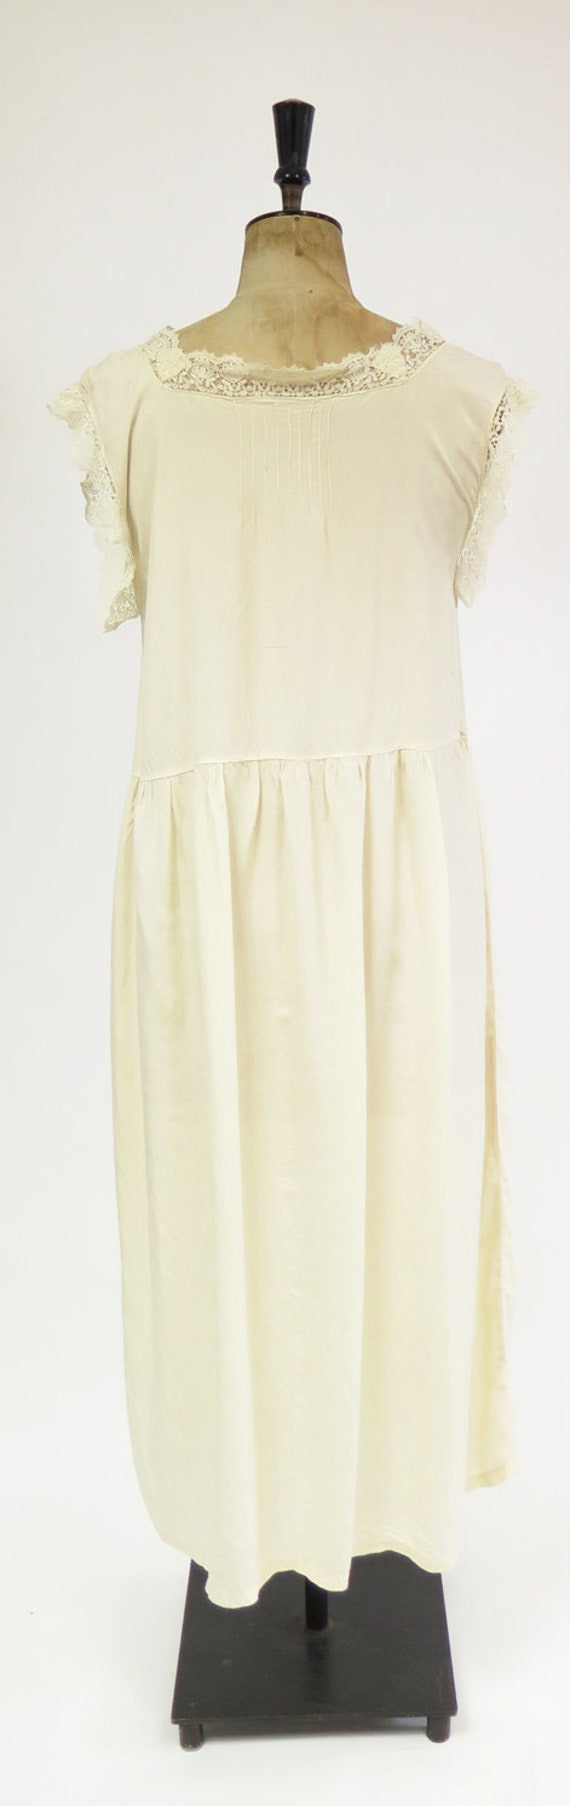 Original Vintage 1920s Deco Cream Silk And Lace D… - image 5